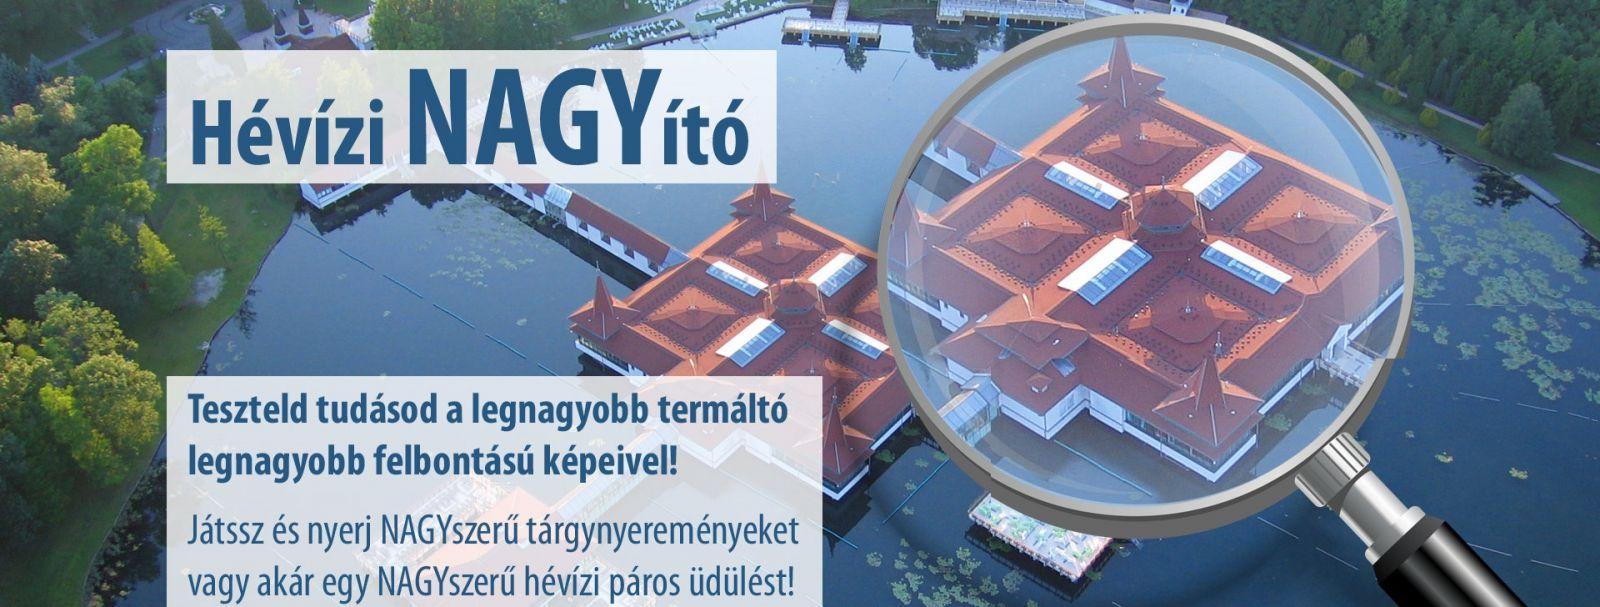 hevizi_nagyito_online_kampany_website_header_1920x734_tegez.jpg